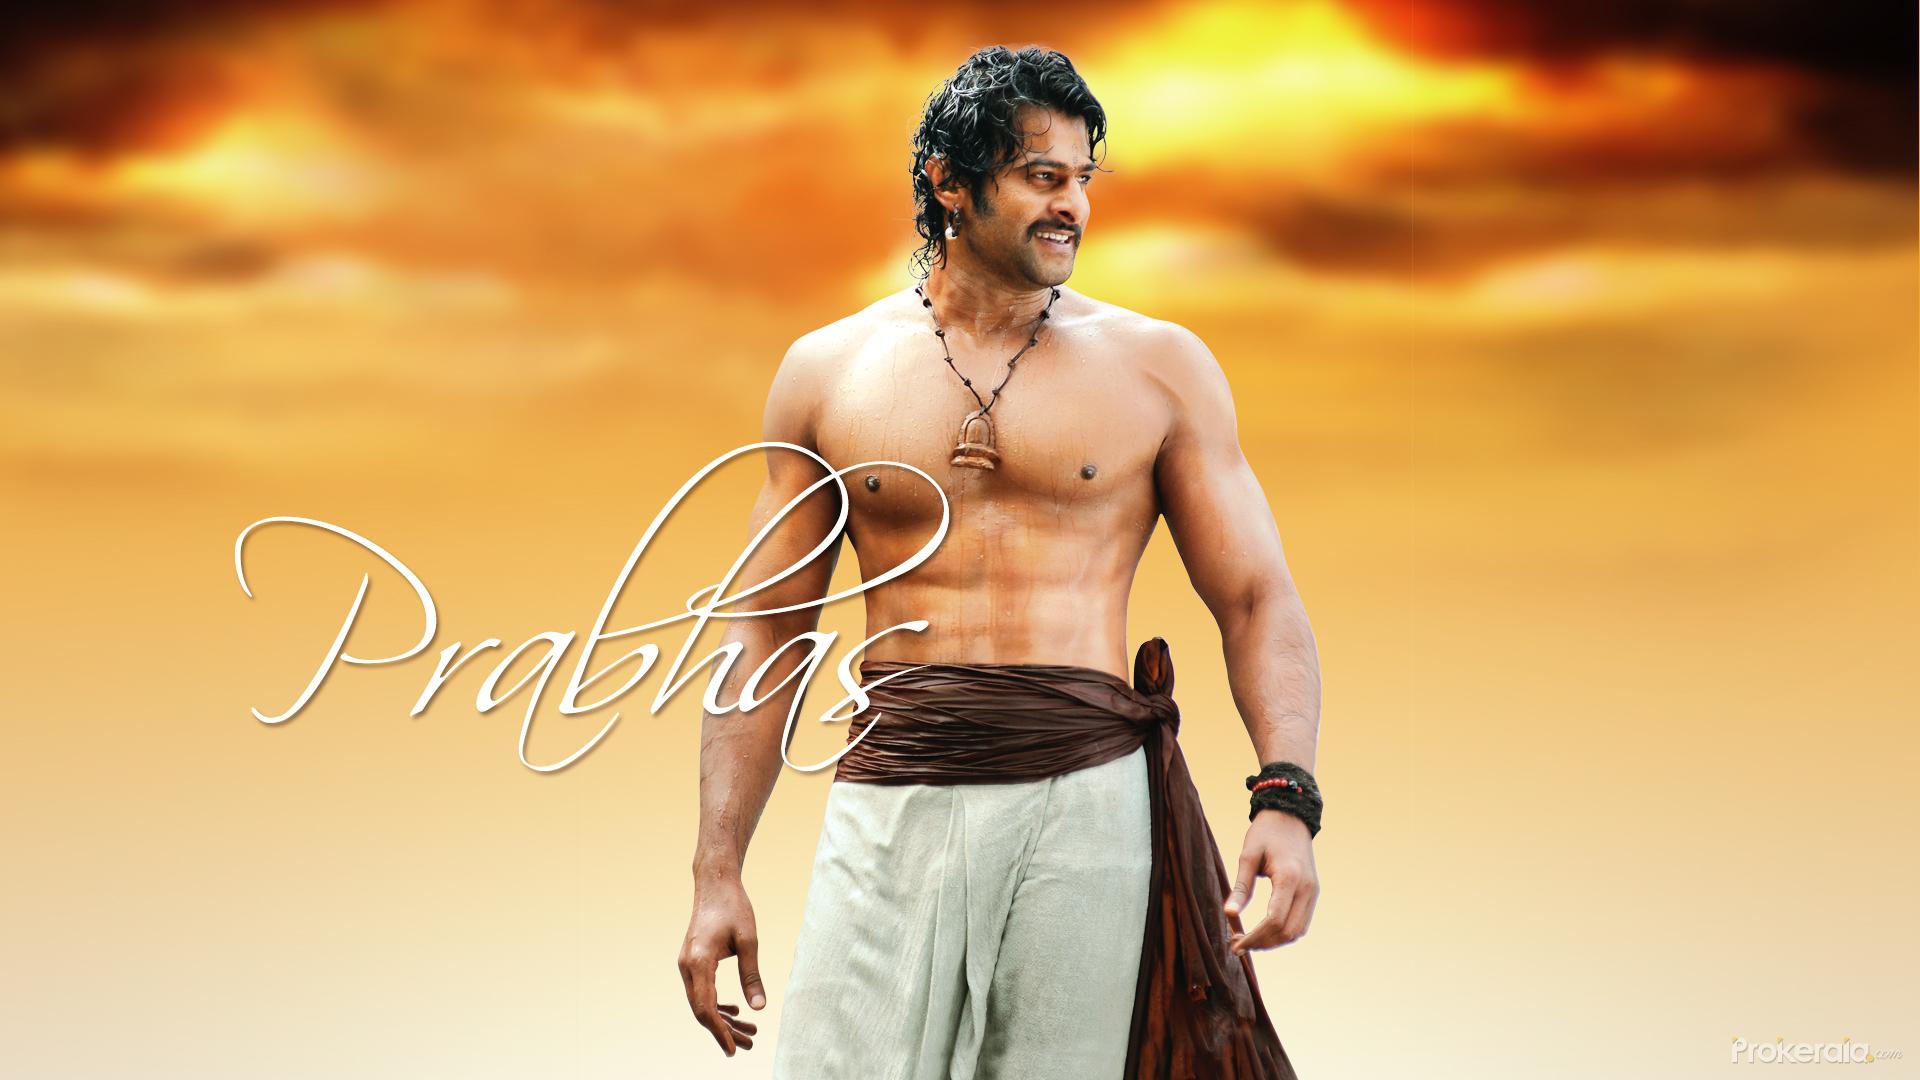 Prabhas Hd Wallpapers Download Telugu Actor Prabhas: Prabhas Wallpaper